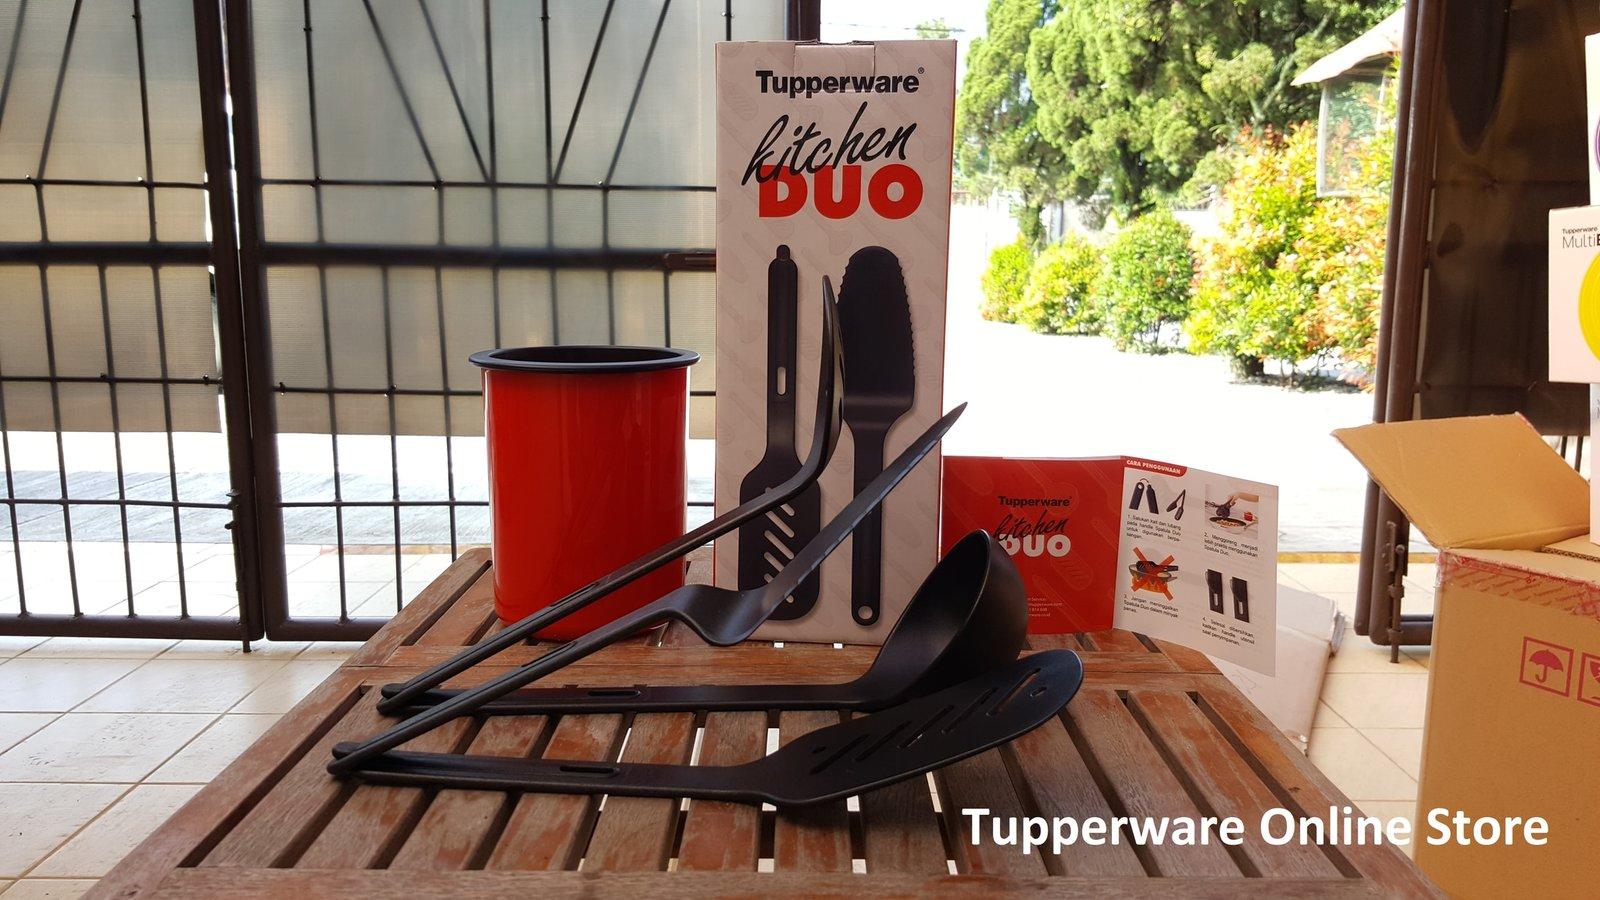 New Tupperware Kitchen Duo Great Kitchenware And 50 Similar Items Luxury Cookware Ampamp Elegenzia Set 1